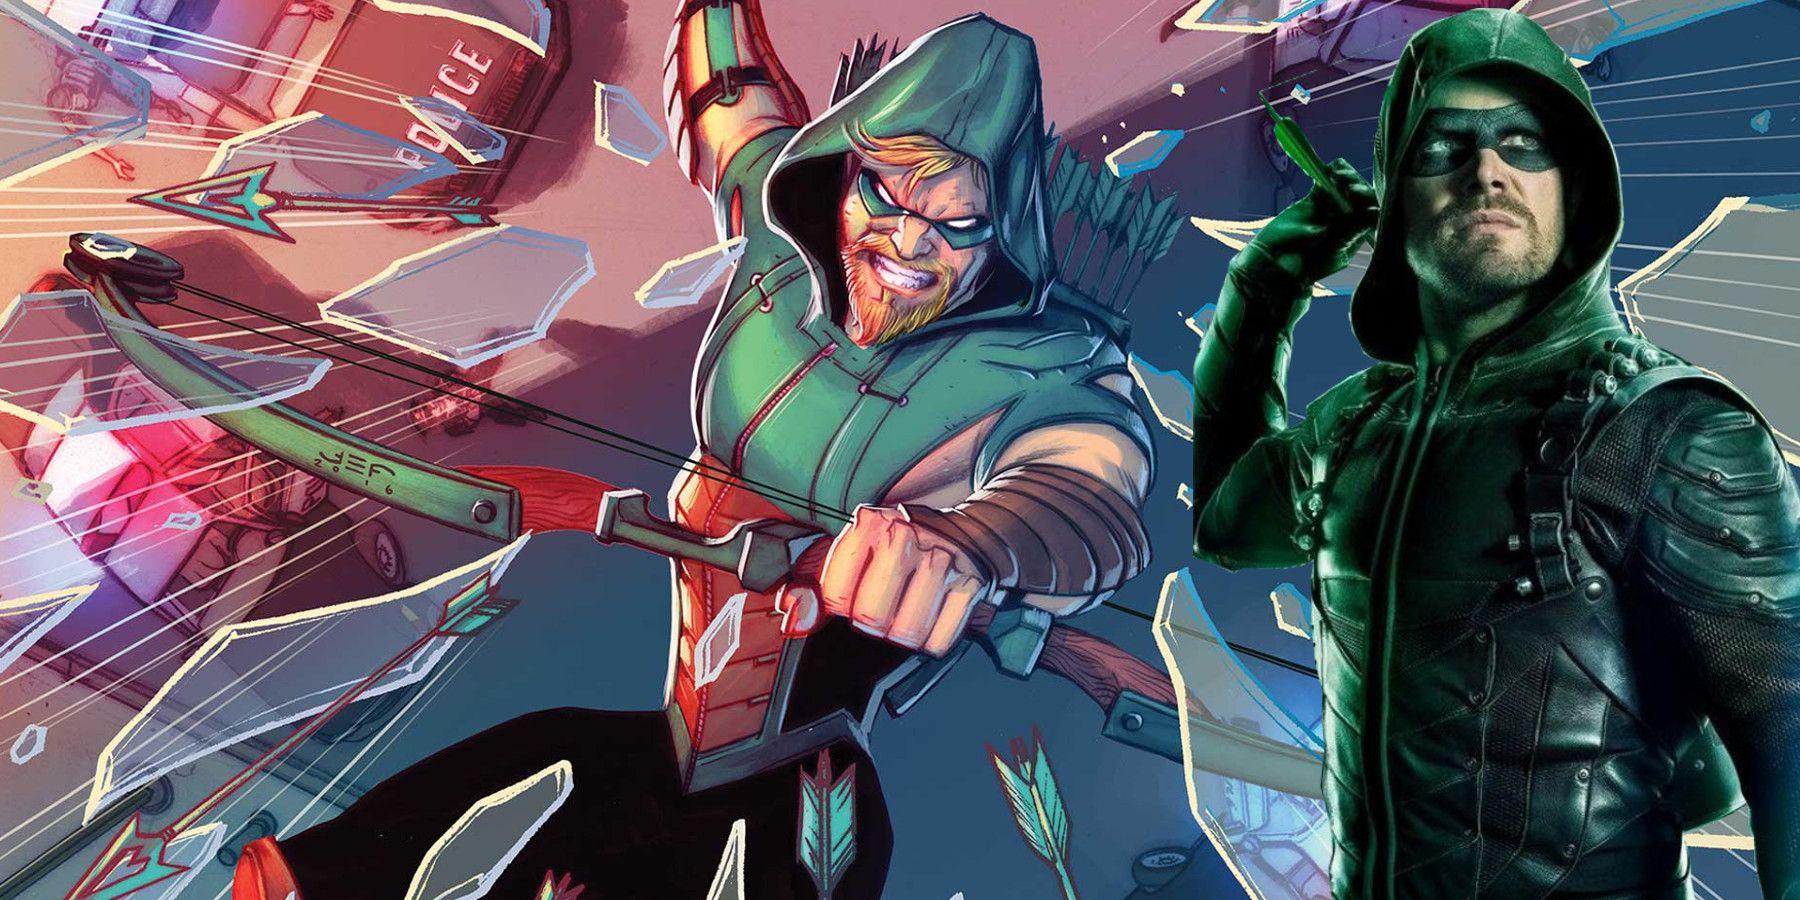 Will Oliver Queen Reveal His Secret Identity In the Arrow Season Finale?